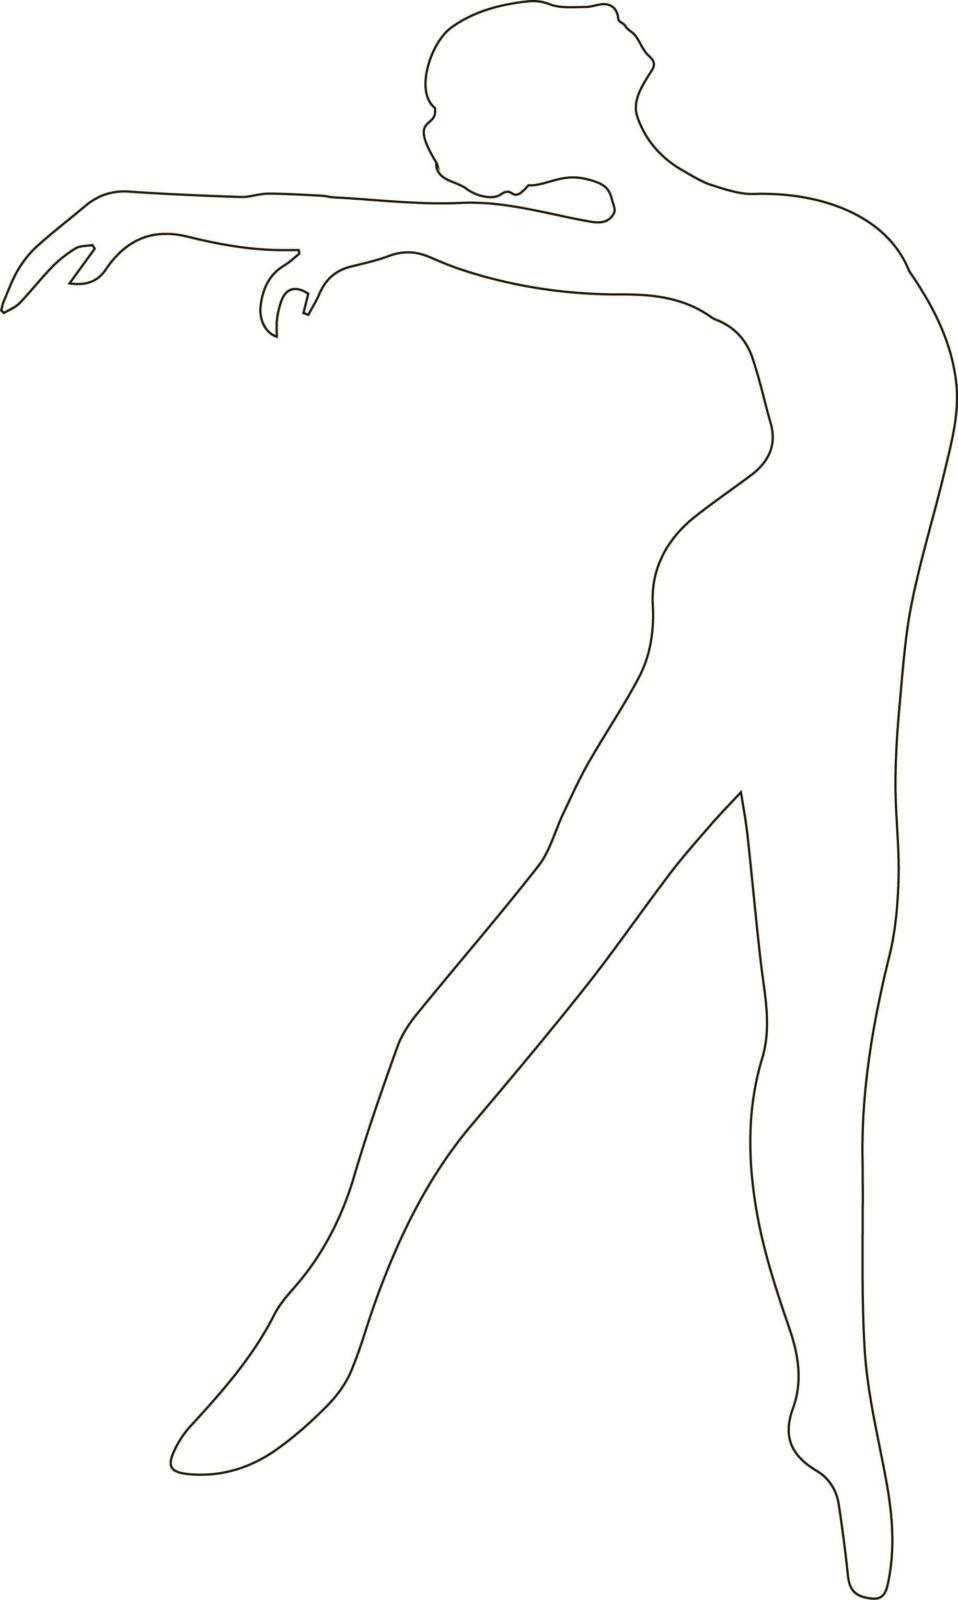 Снежинки-балеринки из бумаги: шаблон 3